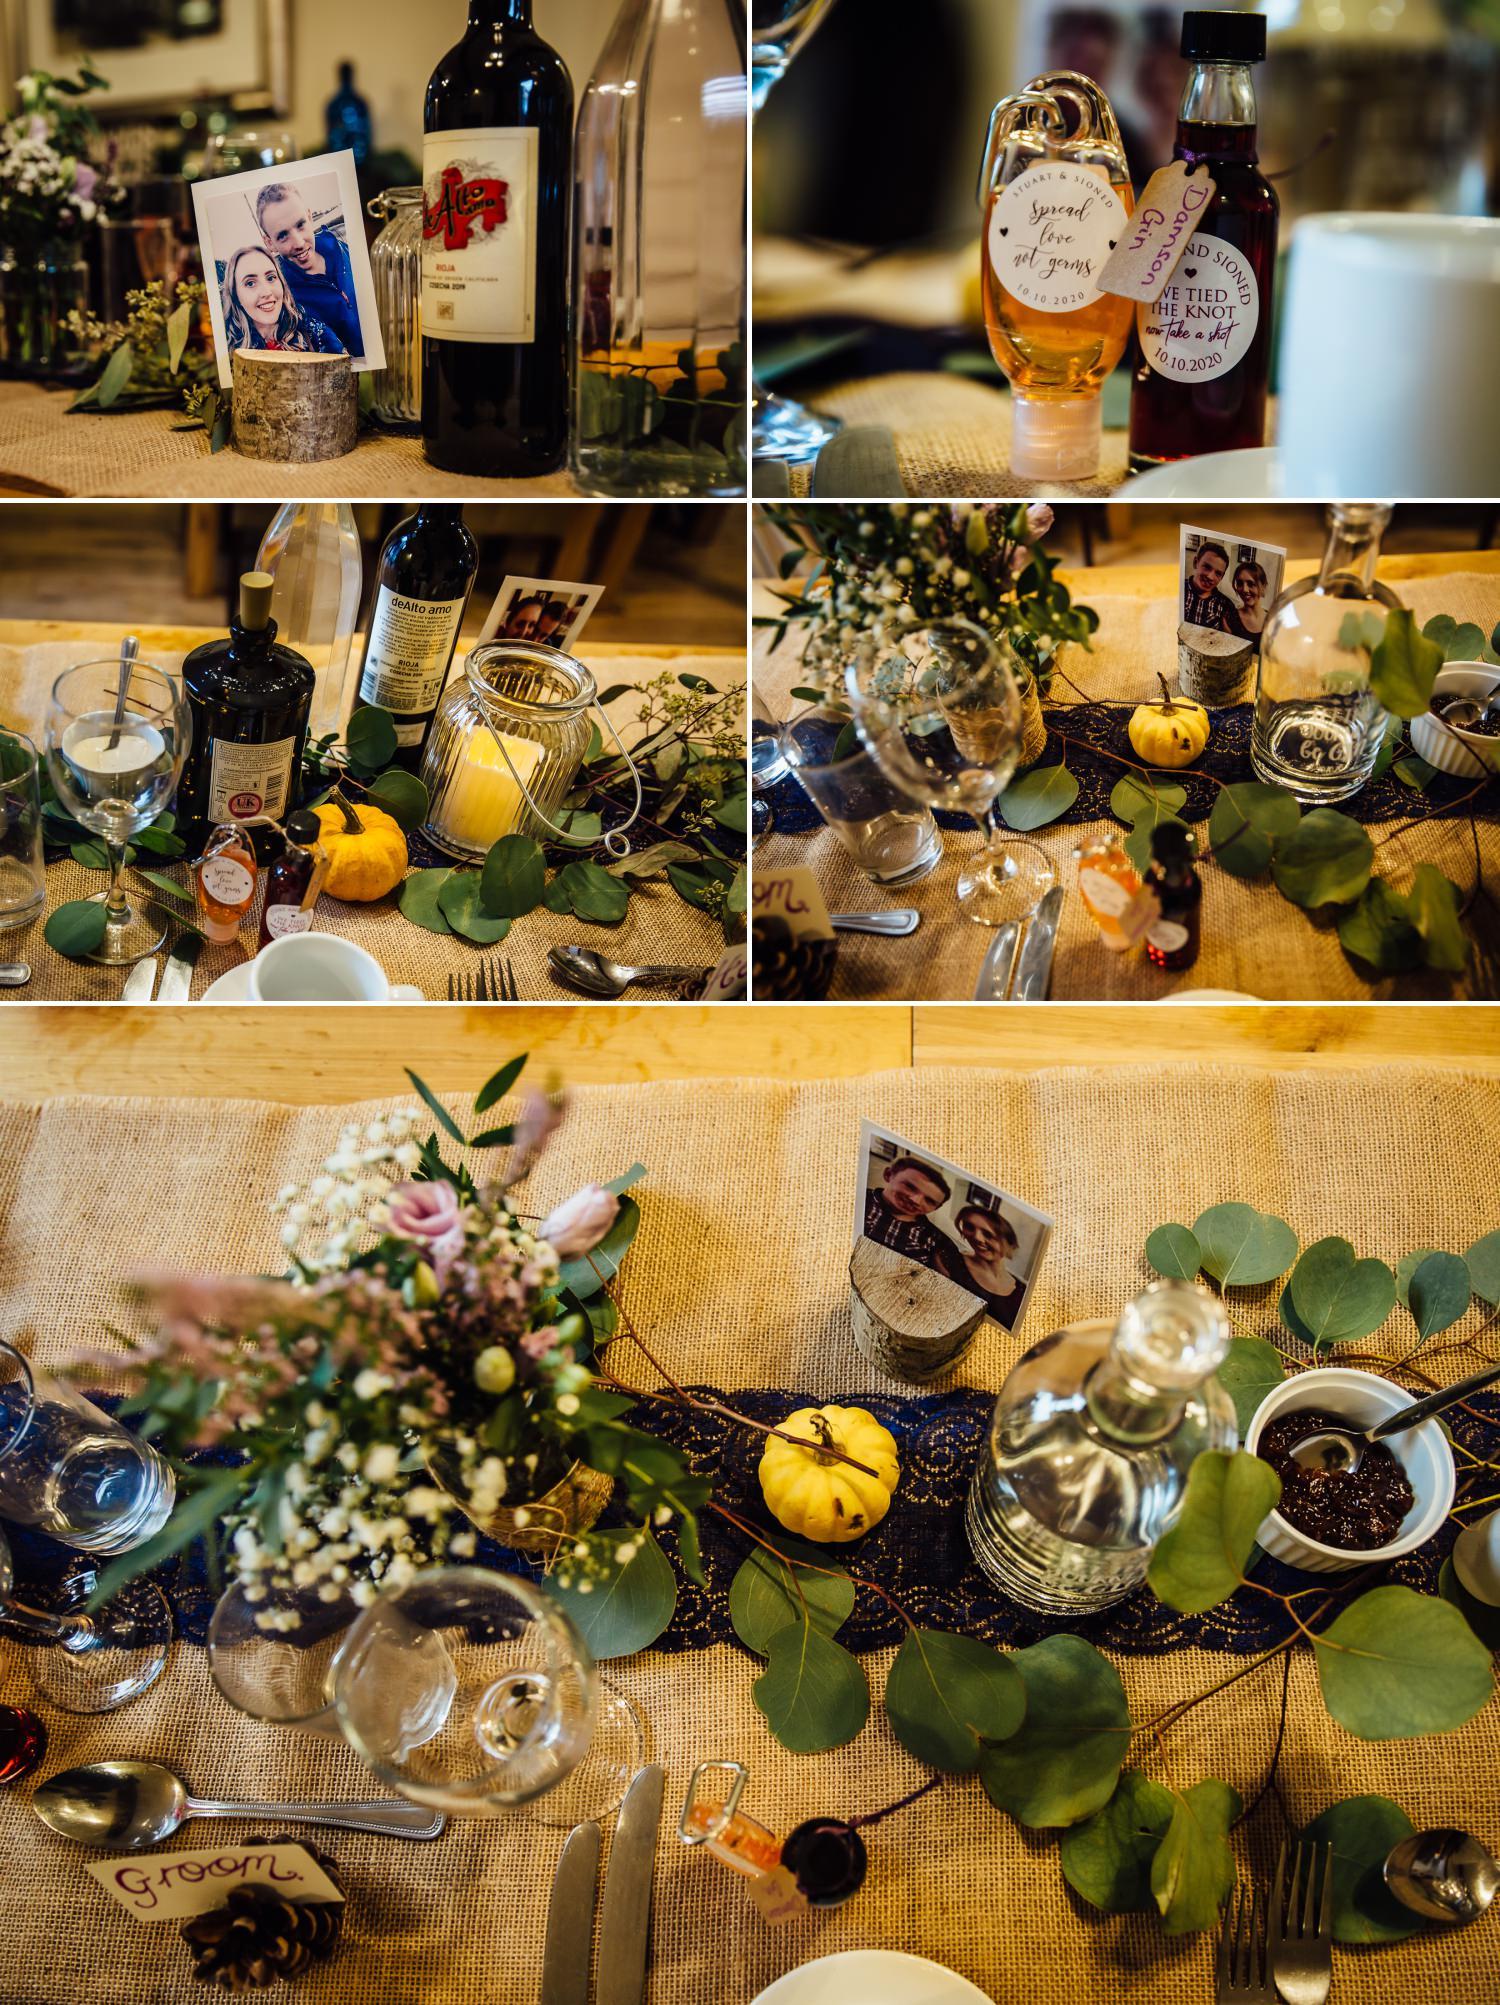 wedding photography of table display at wedding autumn theme